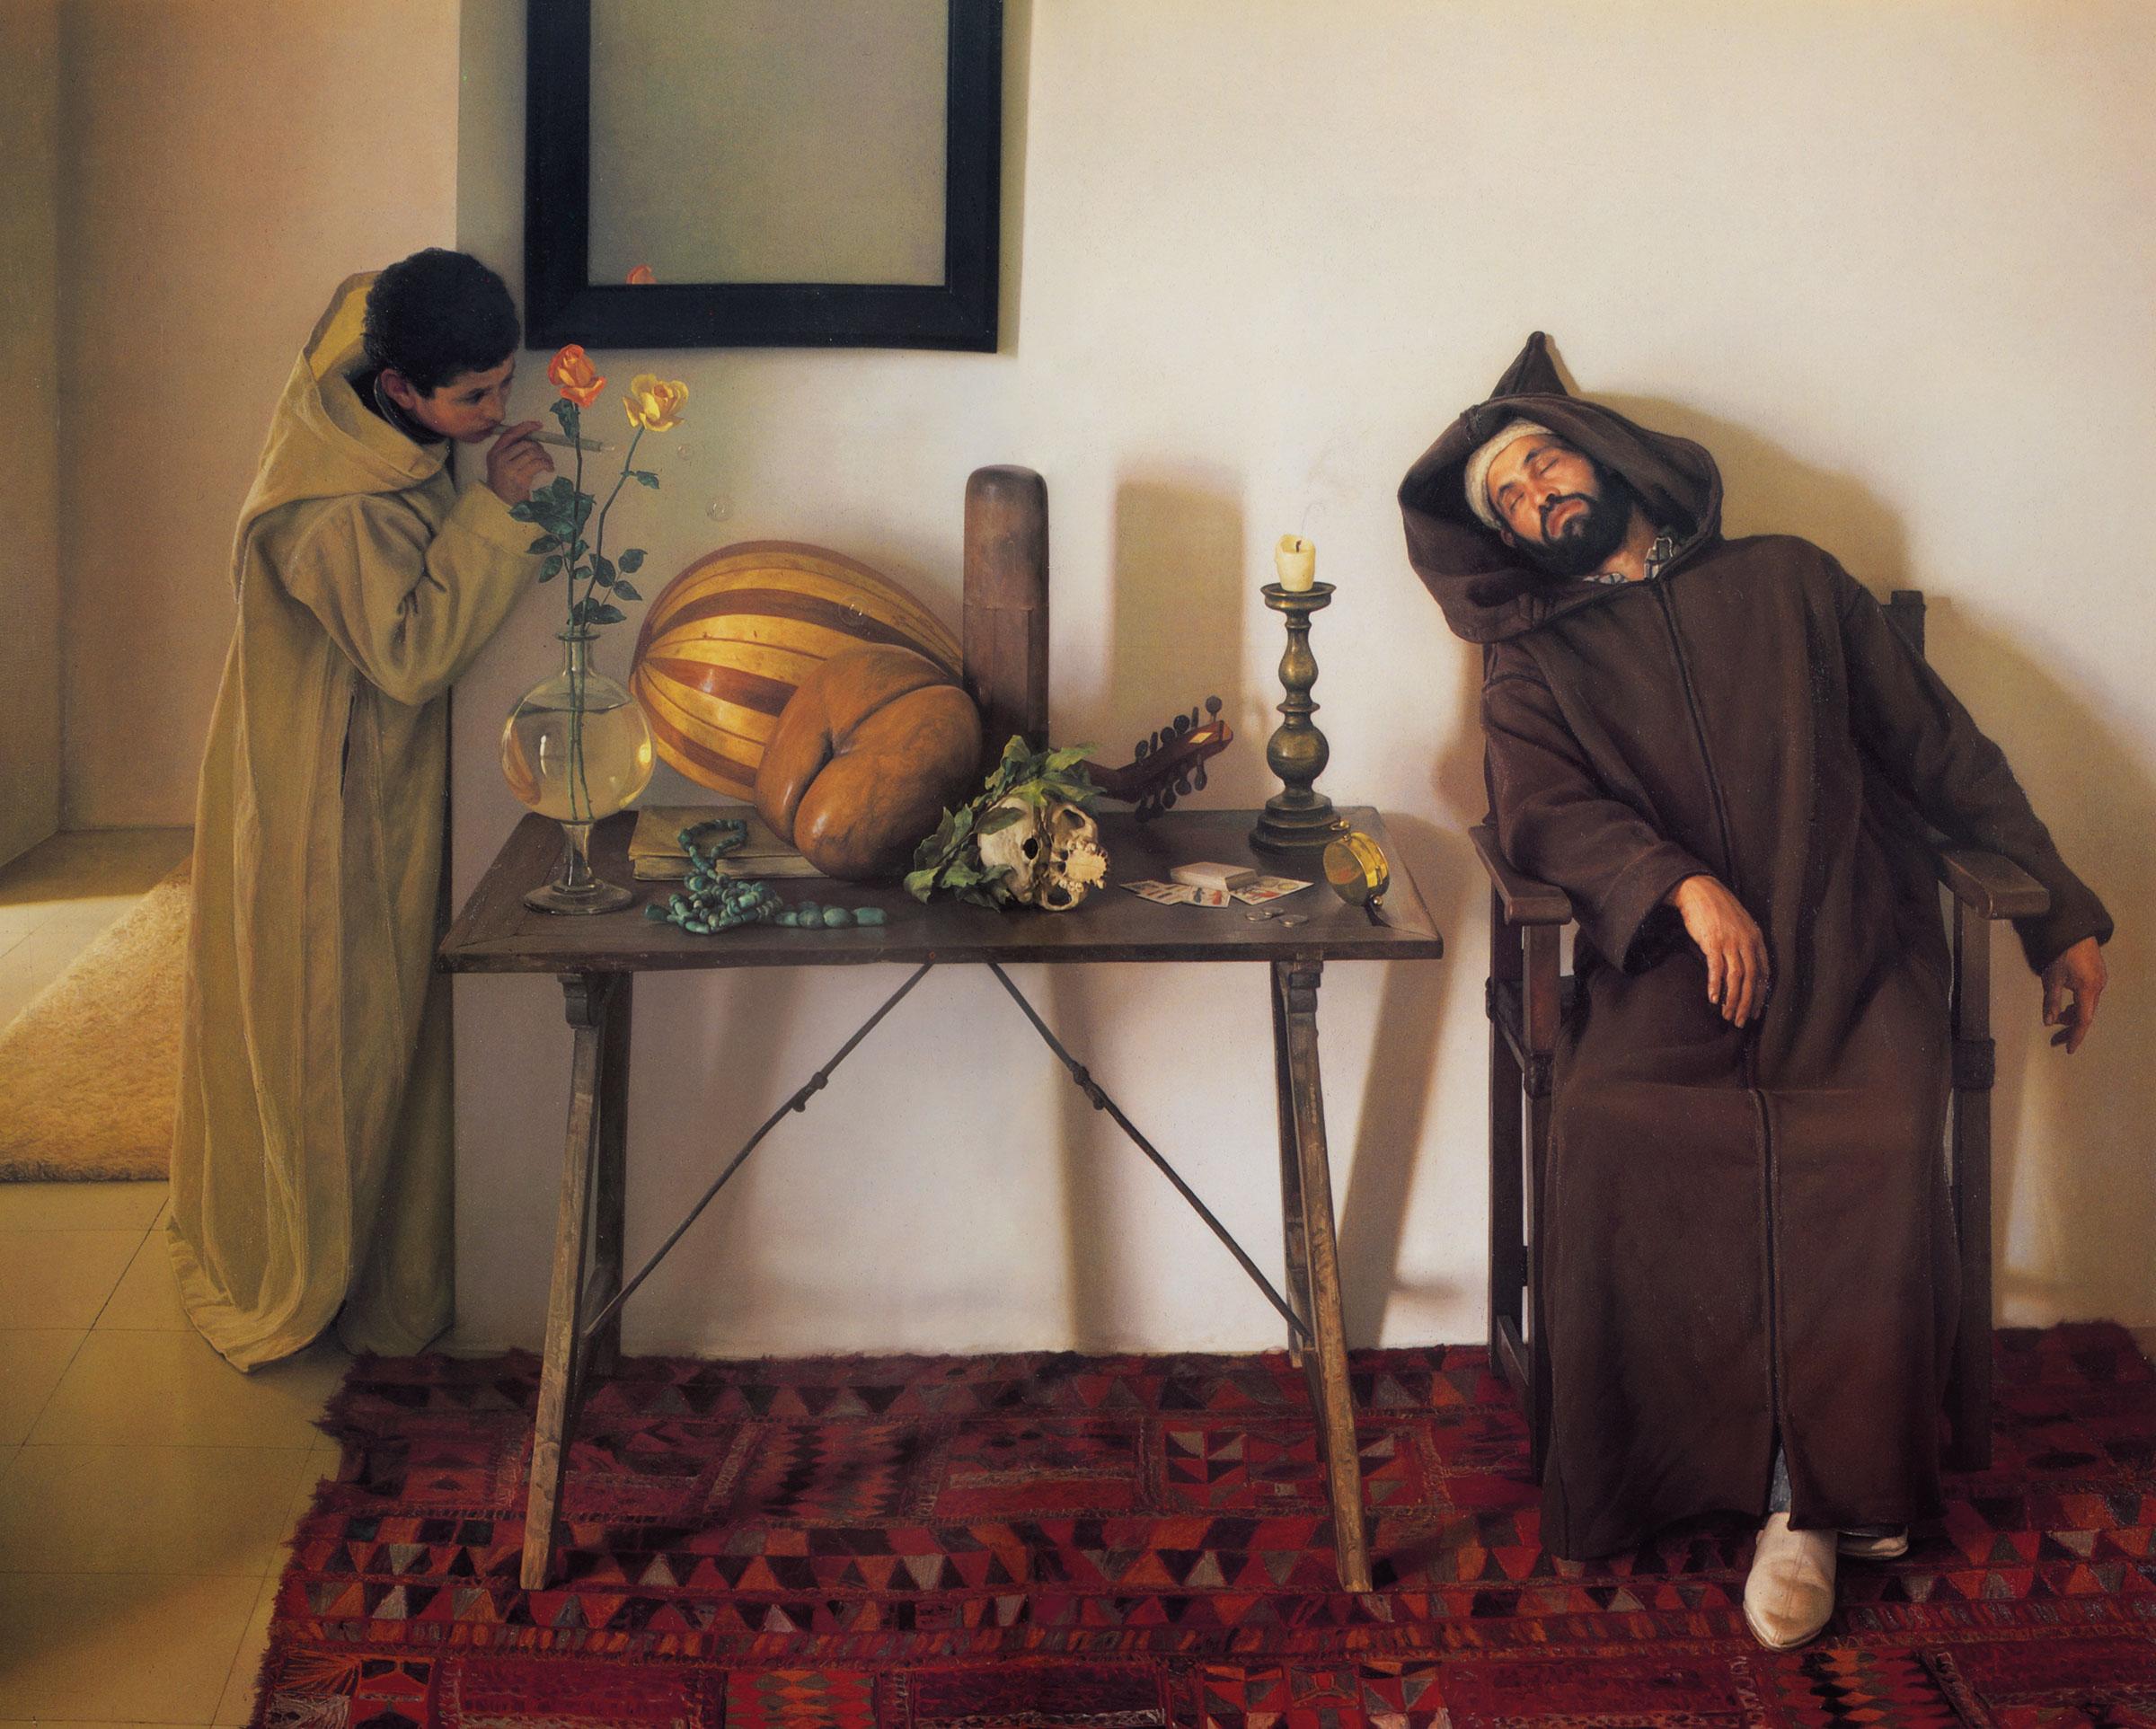 Claudio Bravo: Decorative art from his homes and studio | Christie's